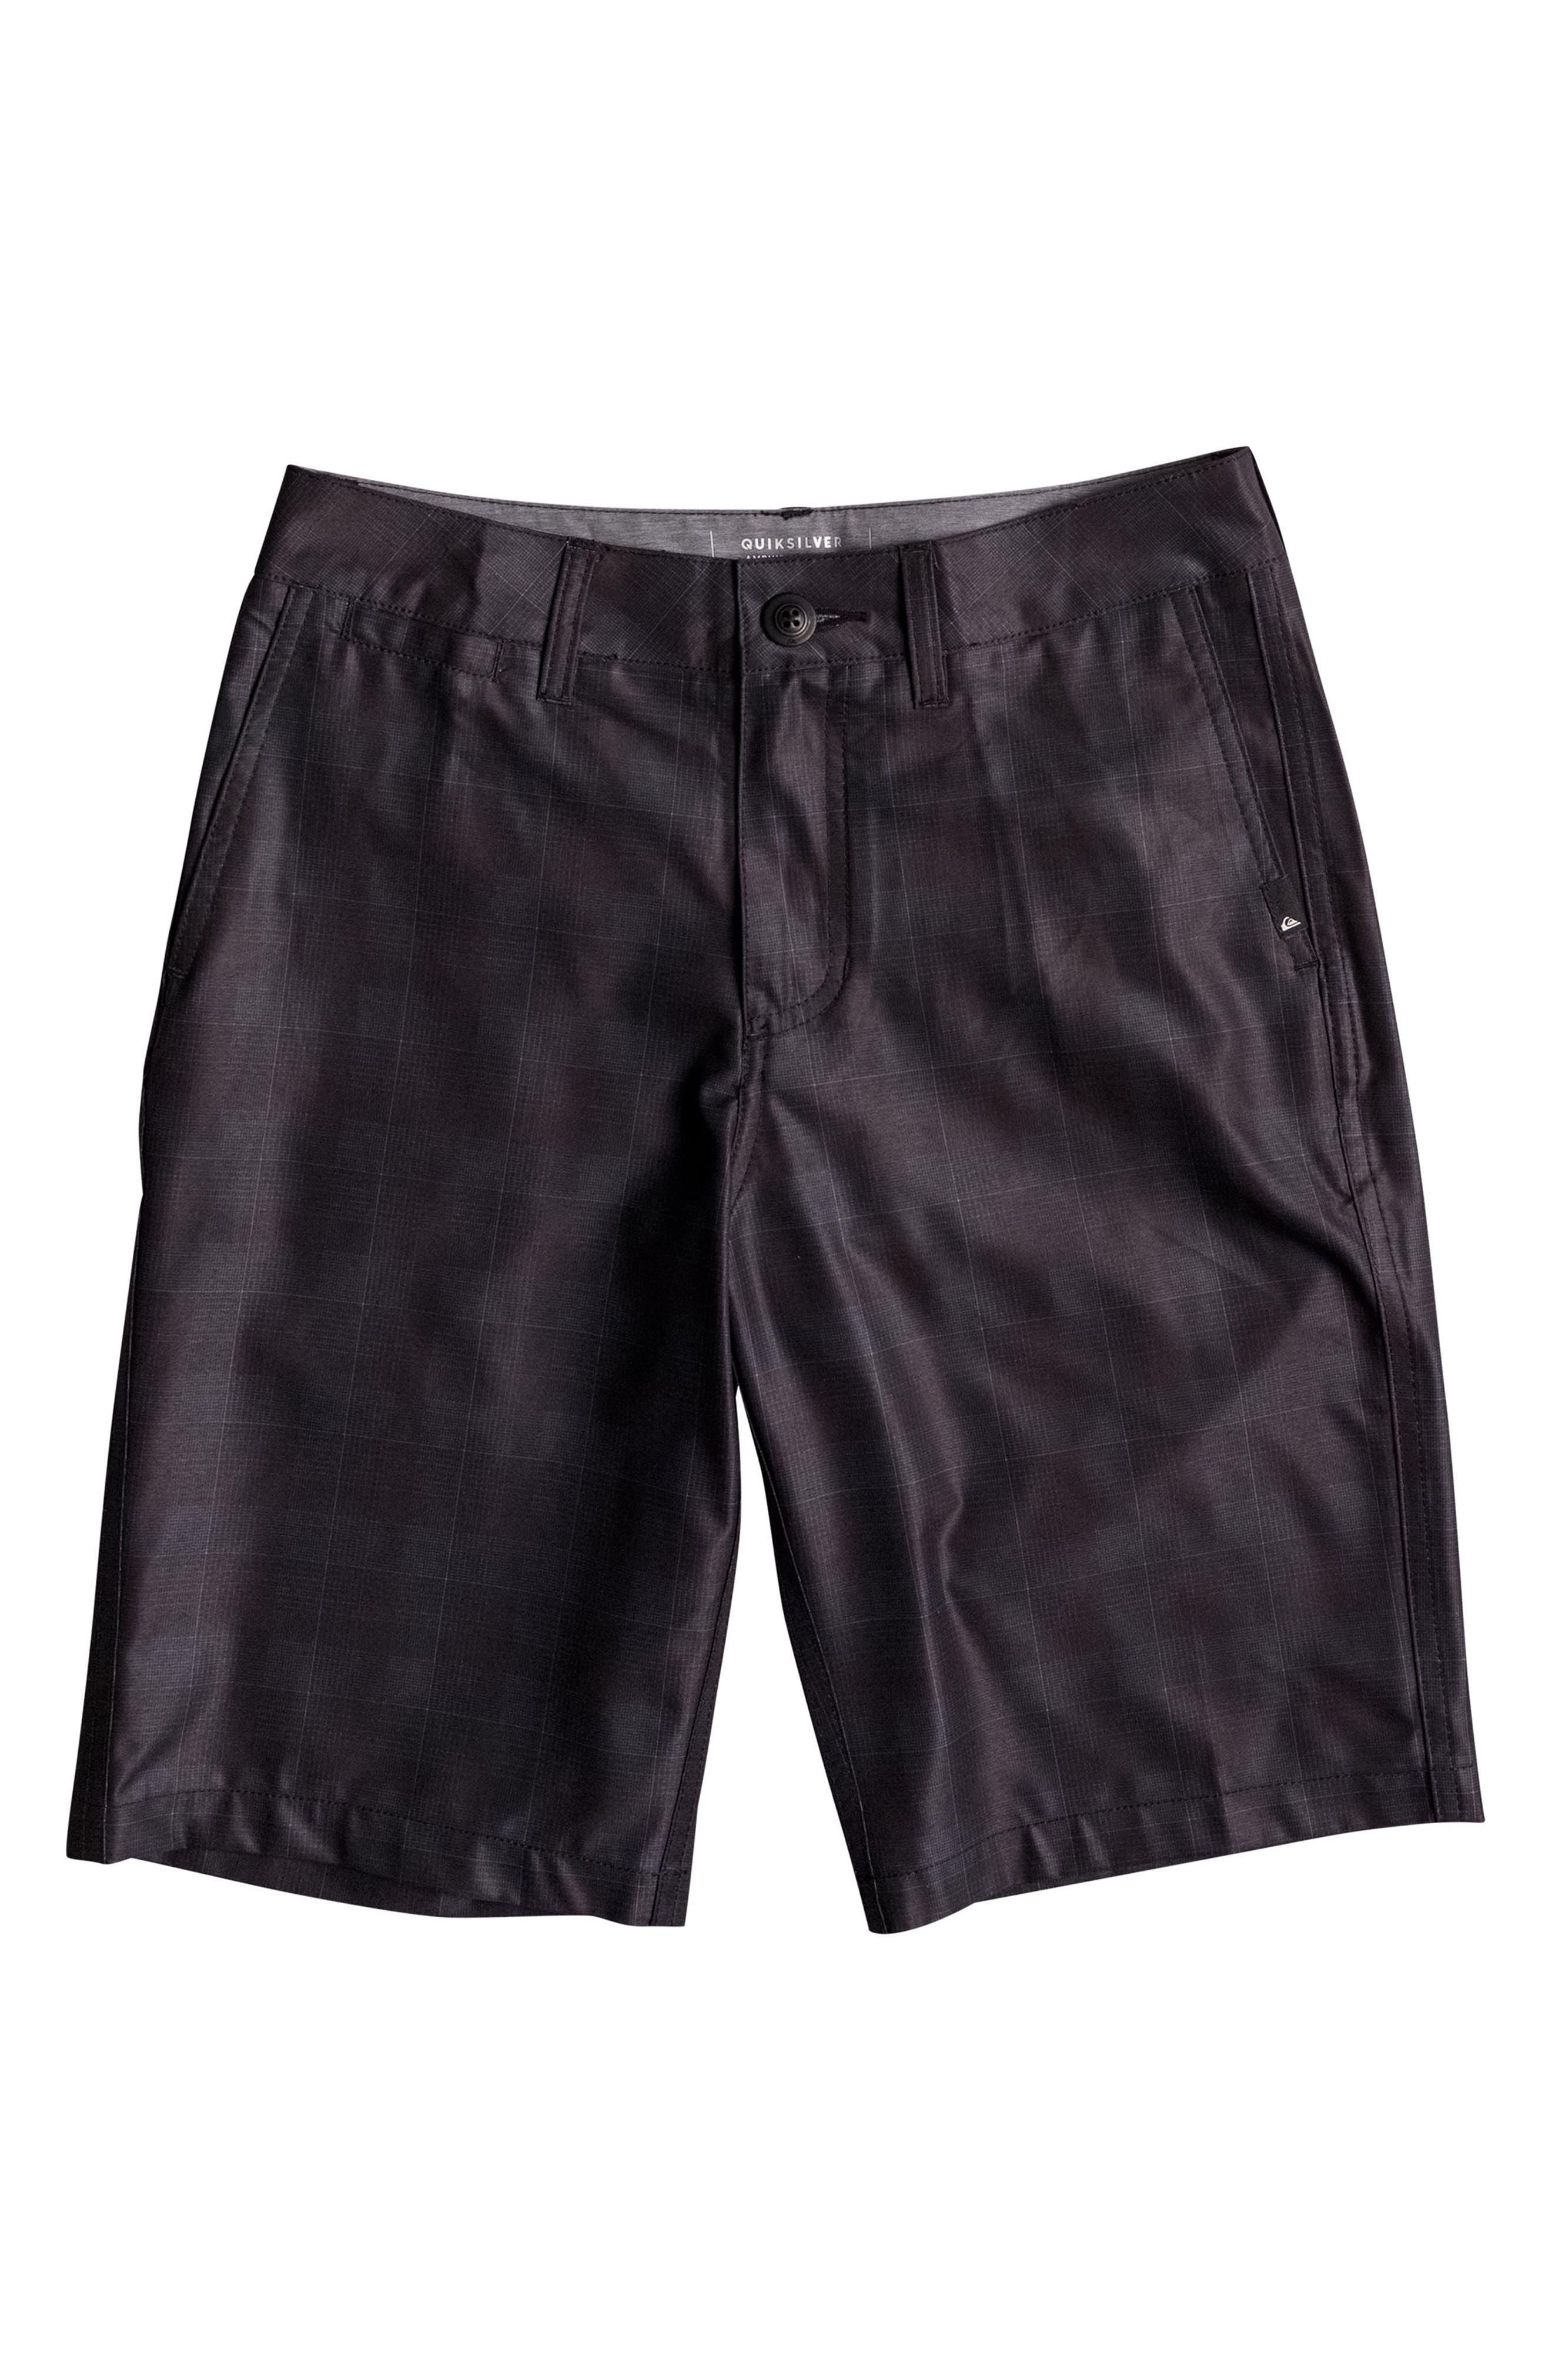 Alternate Image 1 Selected - Quiksilver Union Plaid Amphibian Hybrid Shorts (Big Boys)